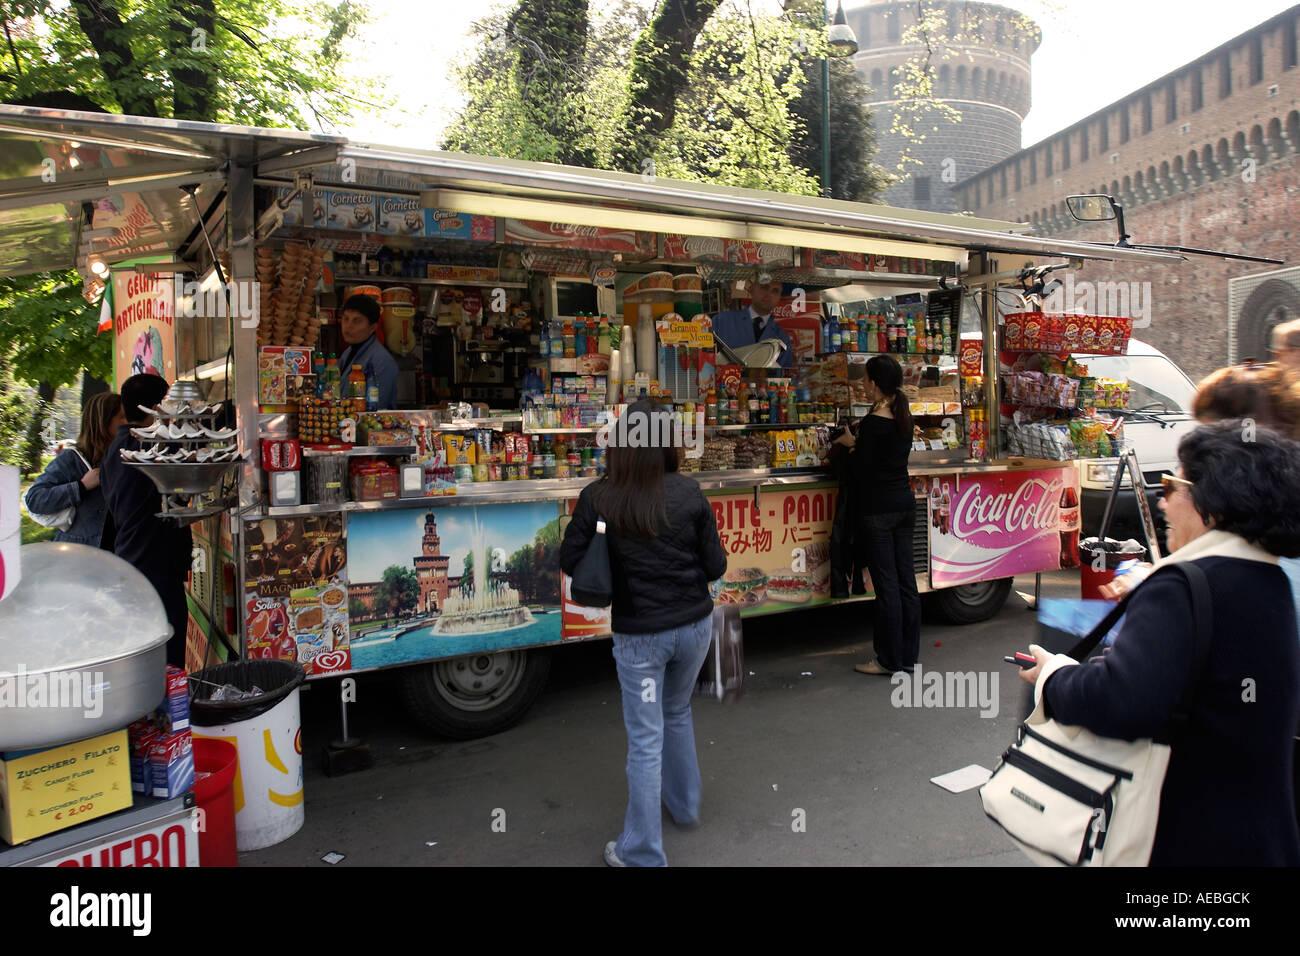 Mobile Smack Bar in Milan Italy - Stock Image